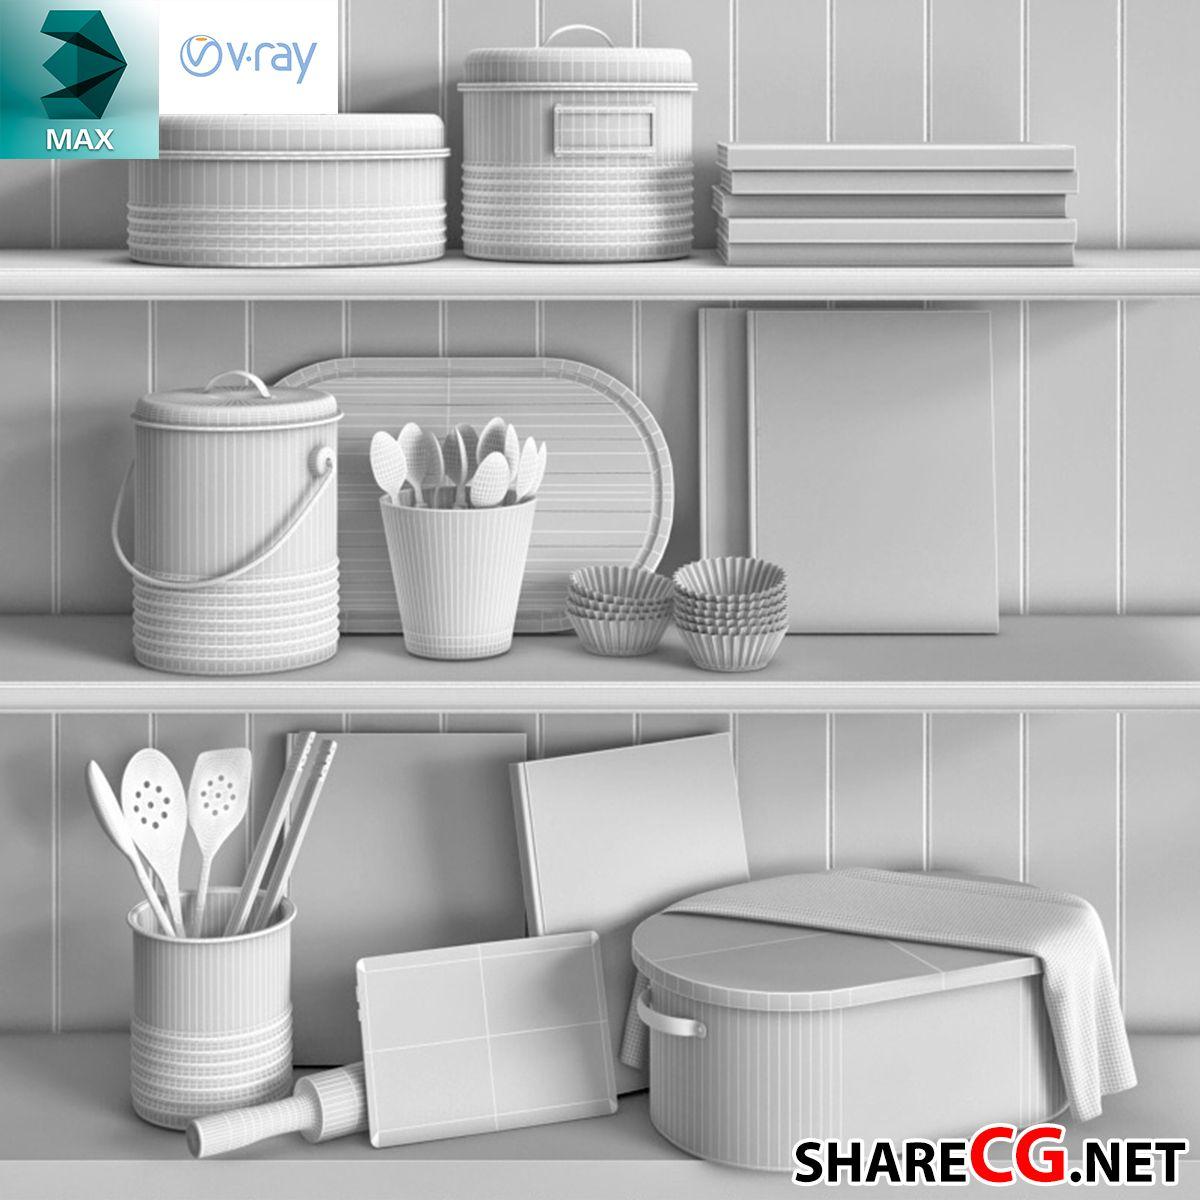 3ds Max Vintage Kitchen Decor - MX-0000042 | sharecg.net | Pinterest ...